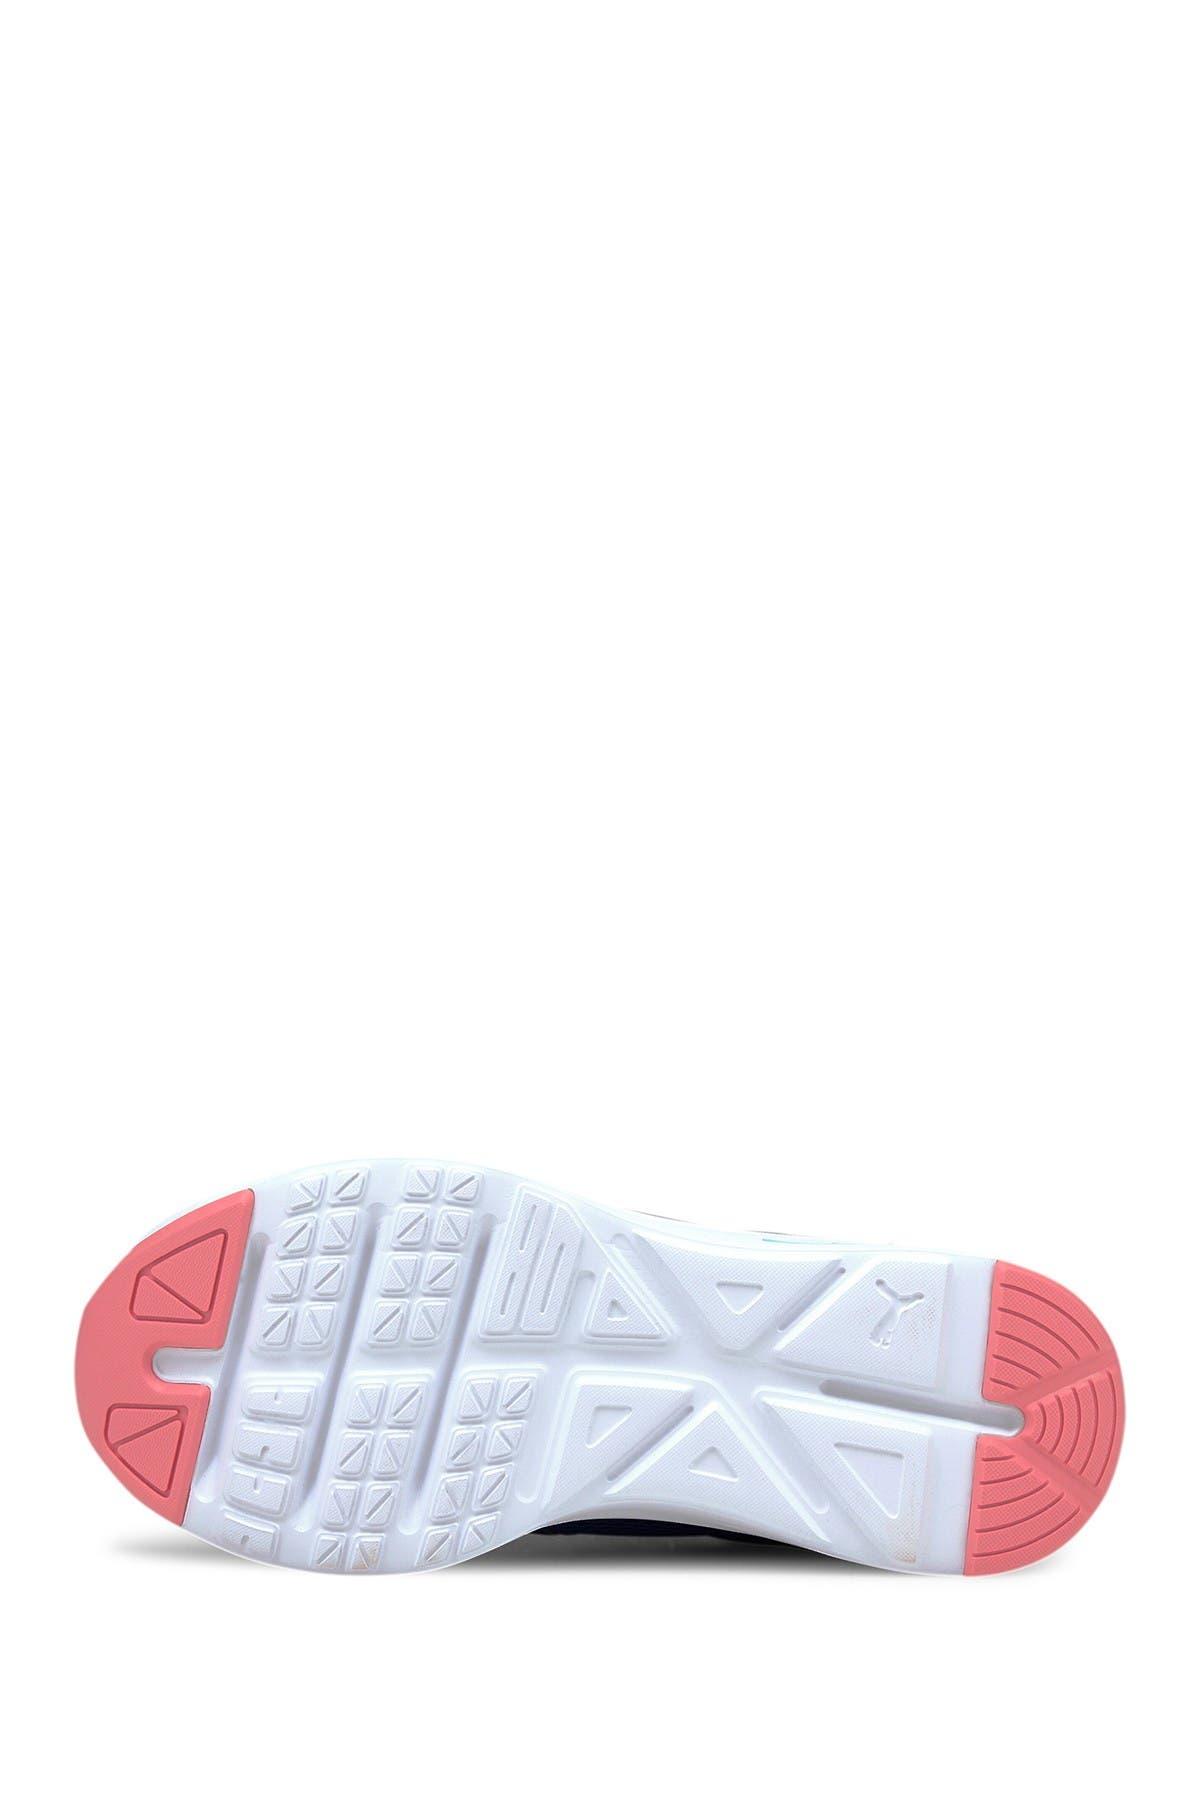 Image of PUMA Enzo 2 Sparkle Sneaker